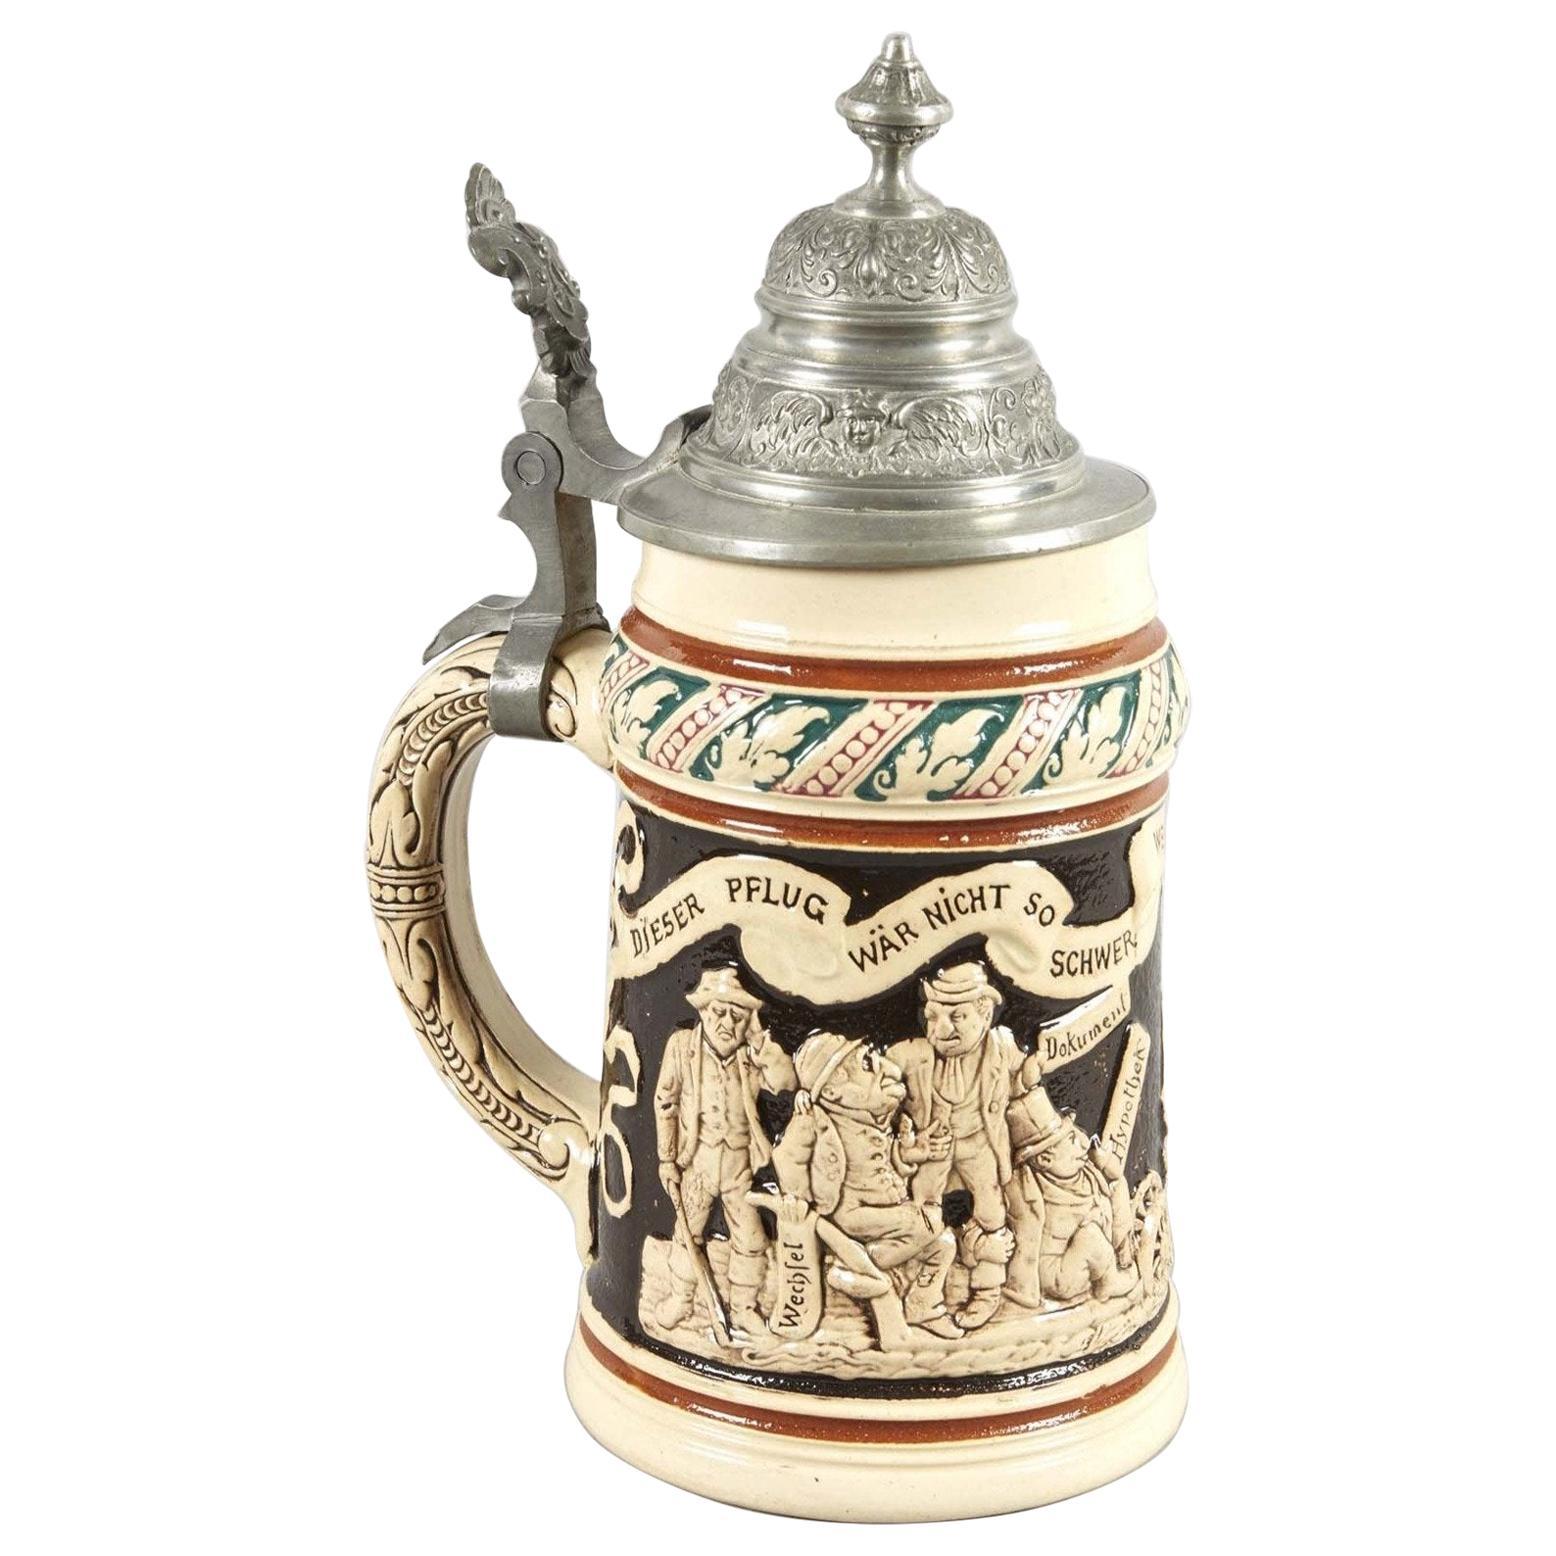 Late 19th Century German Ceramic Beer Stein